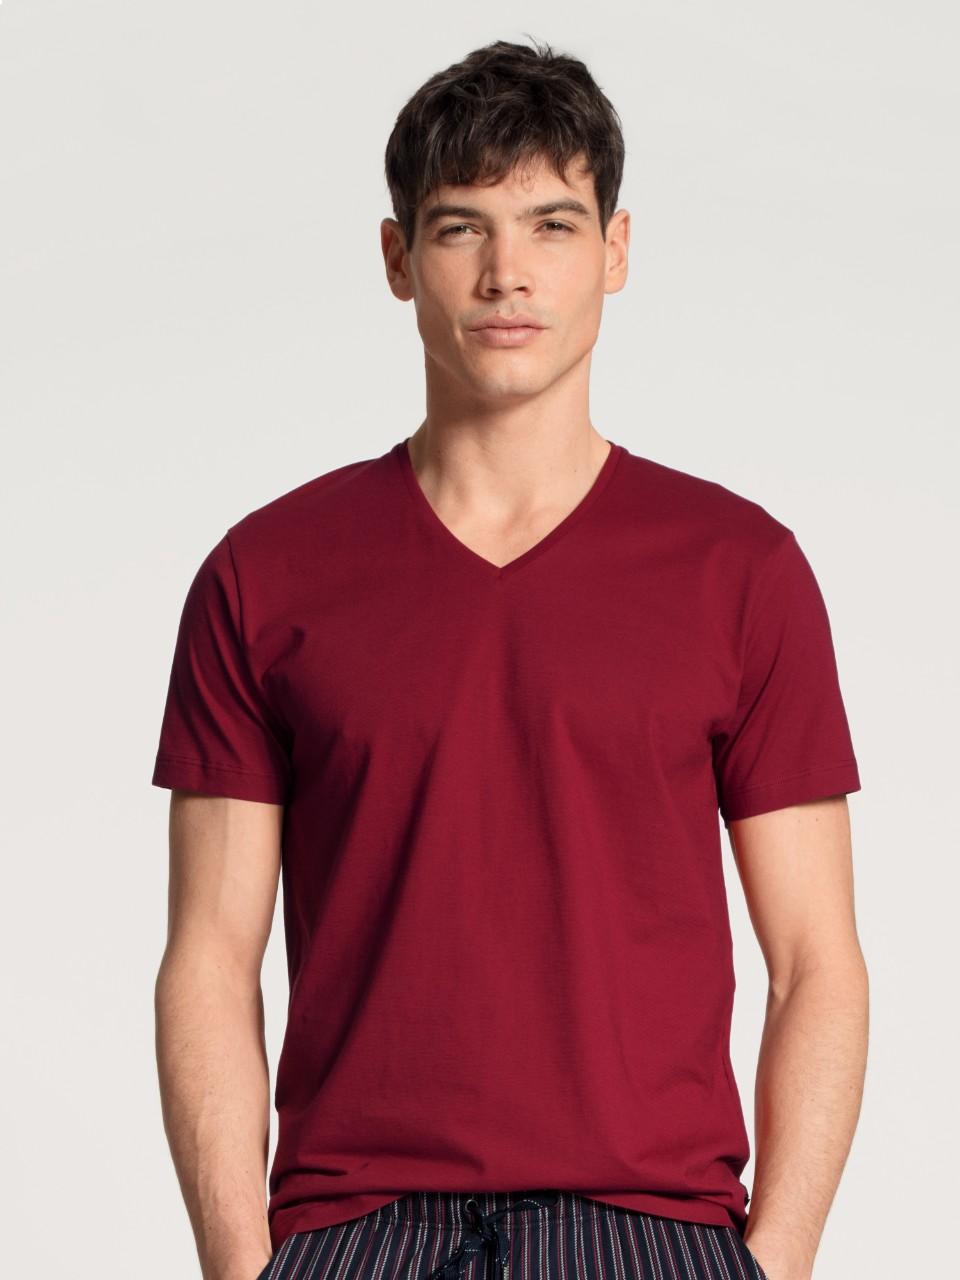 14281 159 tee-shirt bordeaux col V 100% coton jersey Prix : 34.95 €